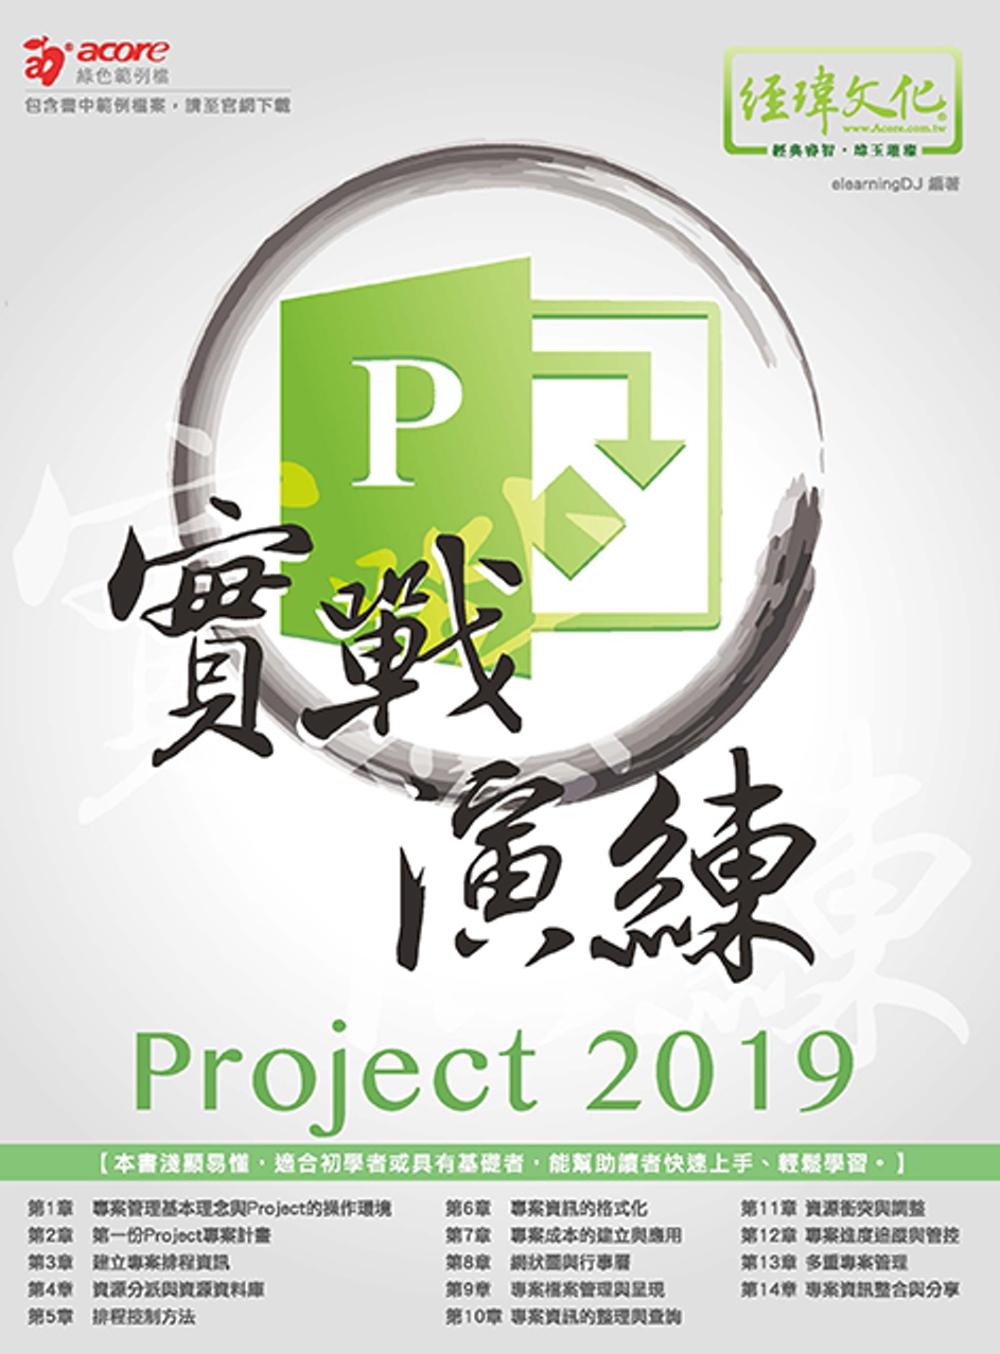 Project 2019 實戰...